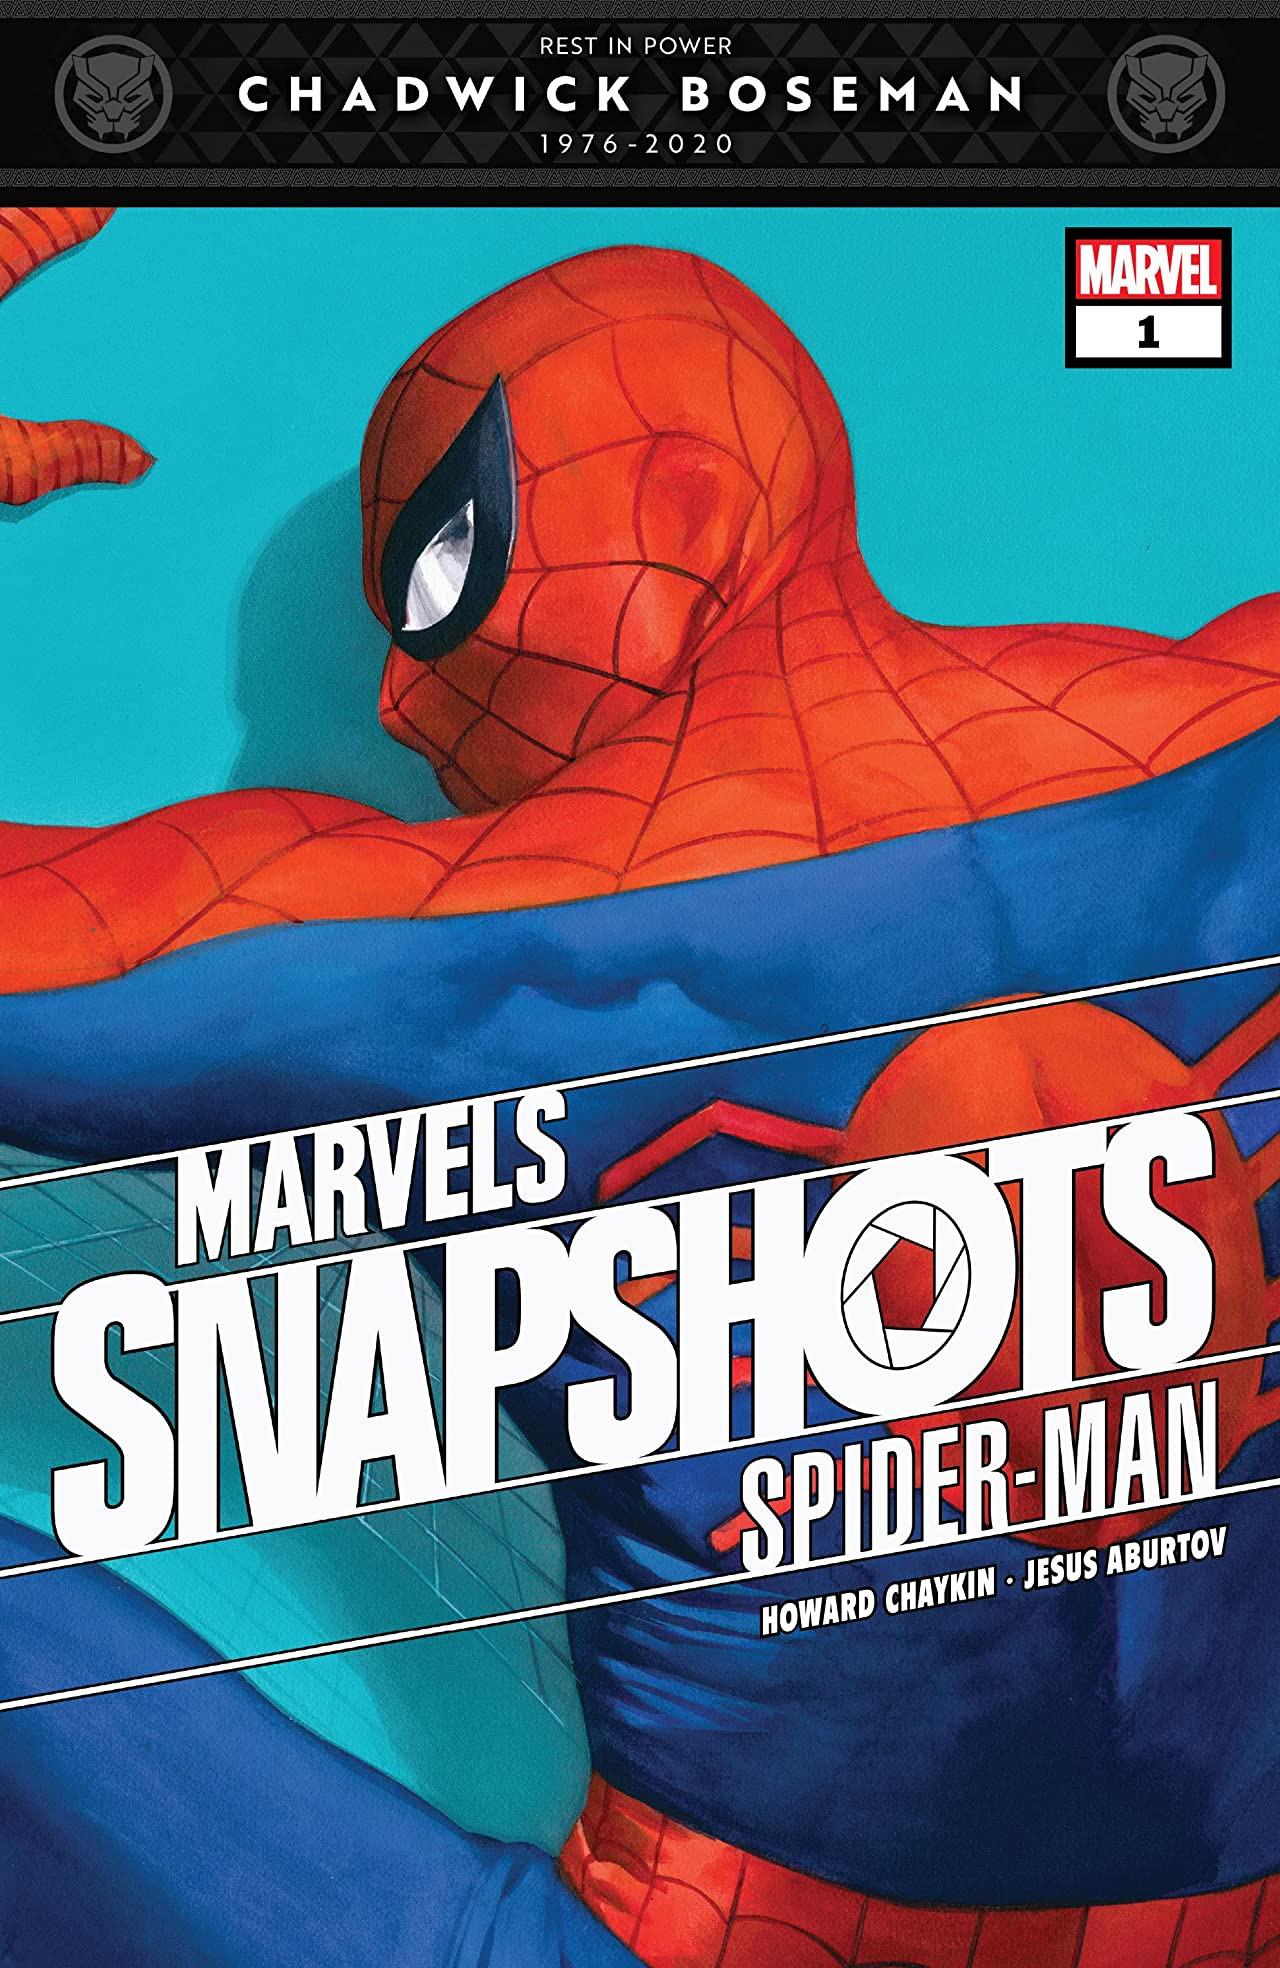 Marvels Snapshots Spider-Man Vol 1 1